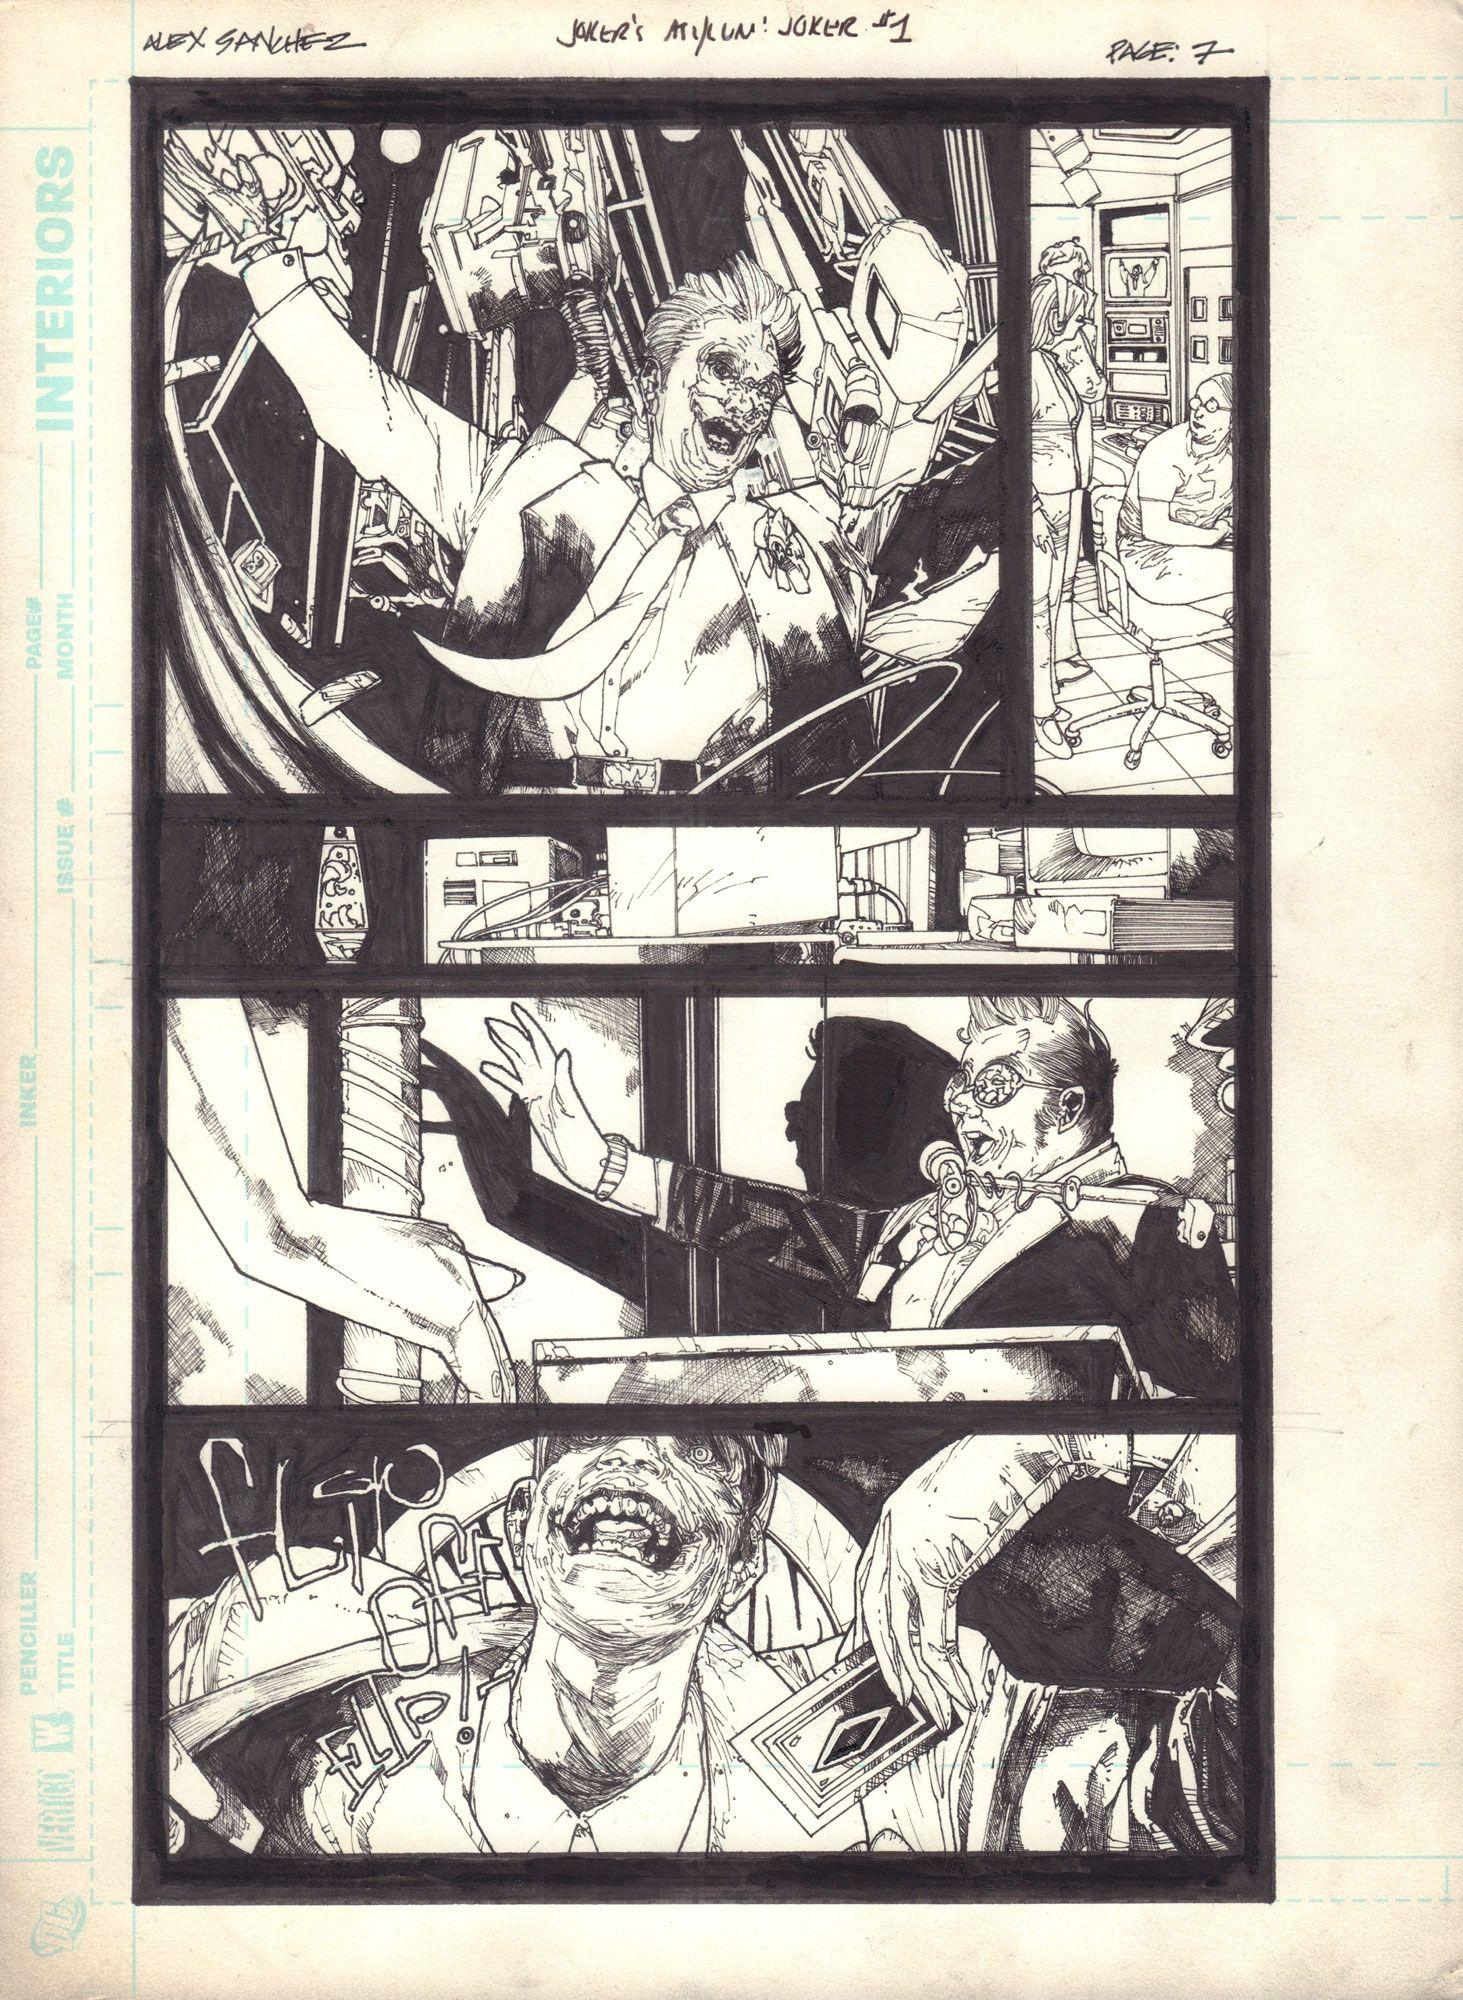 Joker's Asylum: The Joker, s. 7